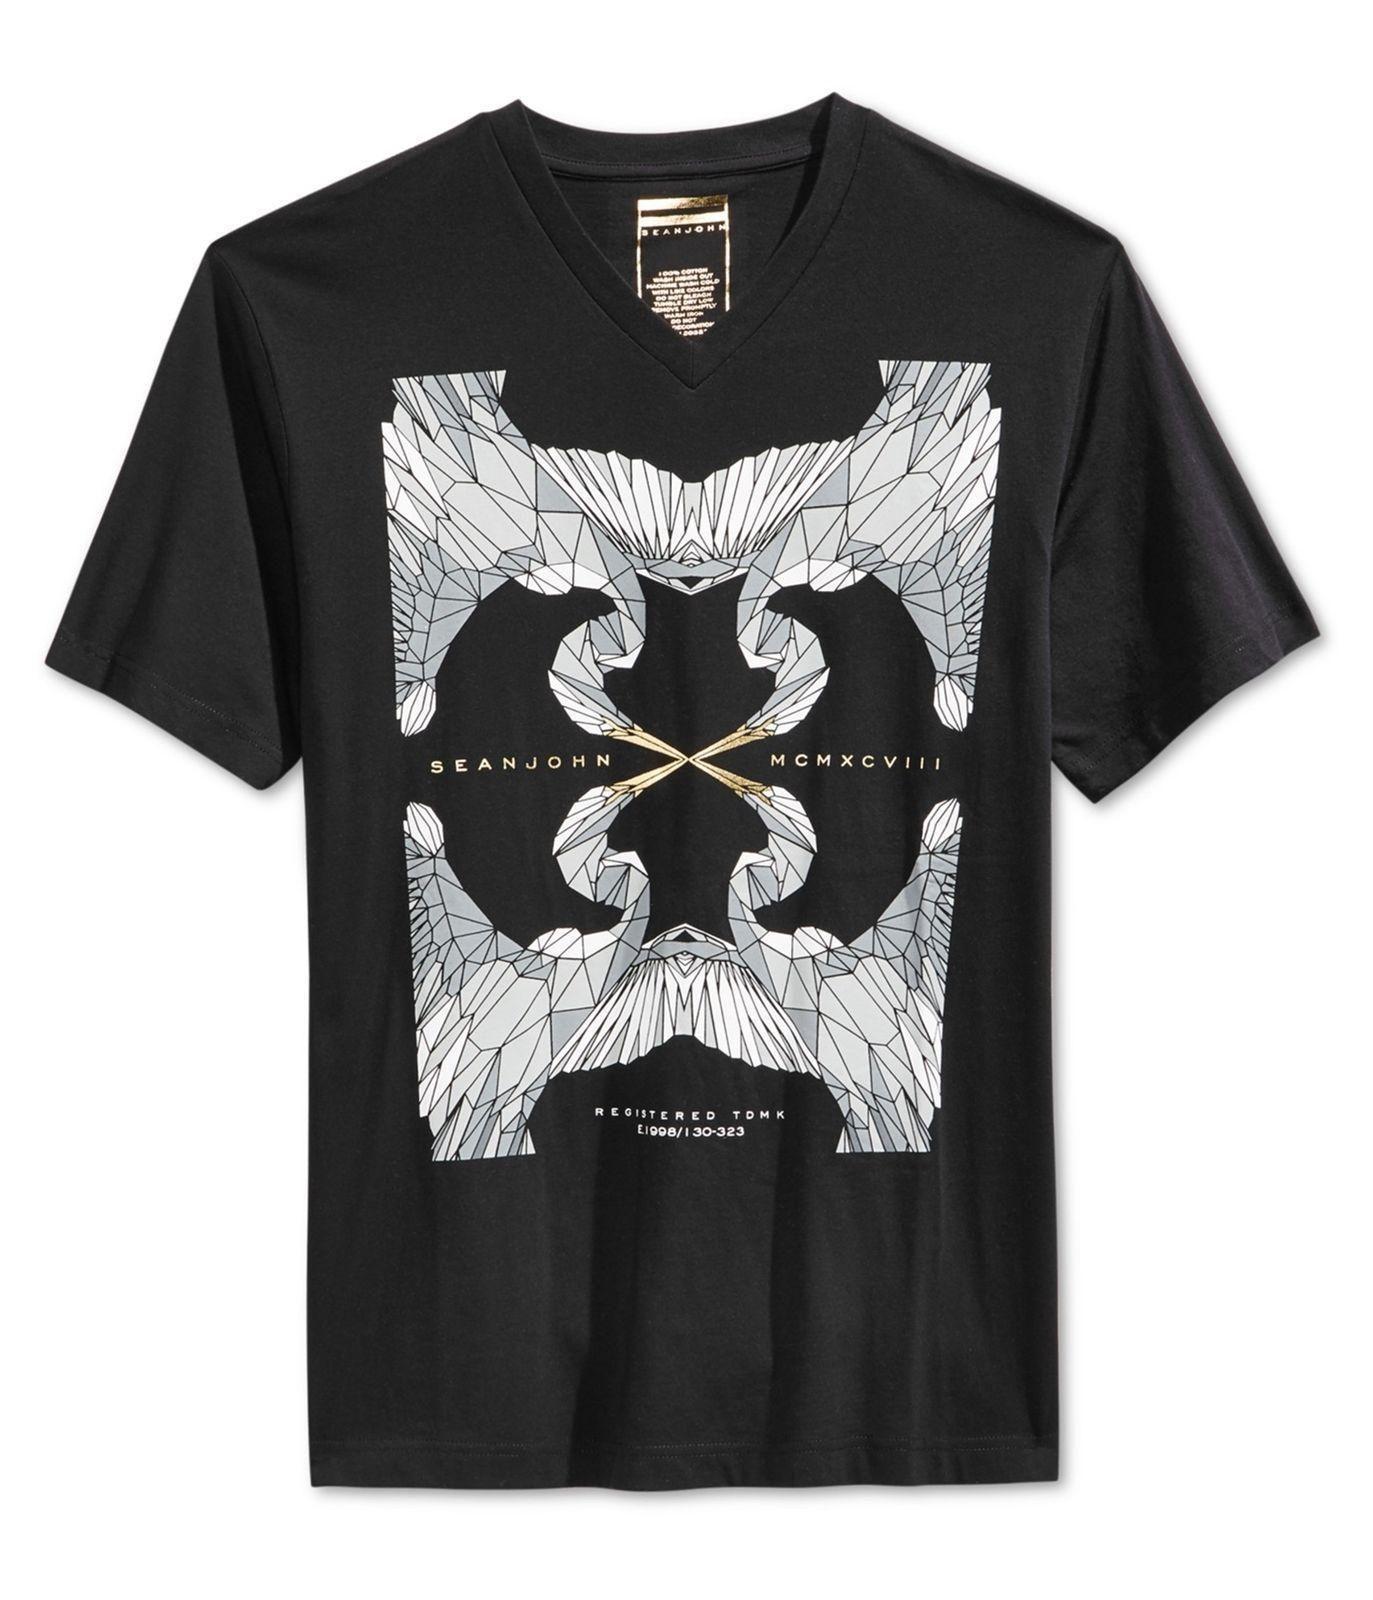 da4b8943c56 Sean John Mens MCMXCVIII Graphic T Shirt Awesome Shirts Cool T Shirts For  Men From Jie40